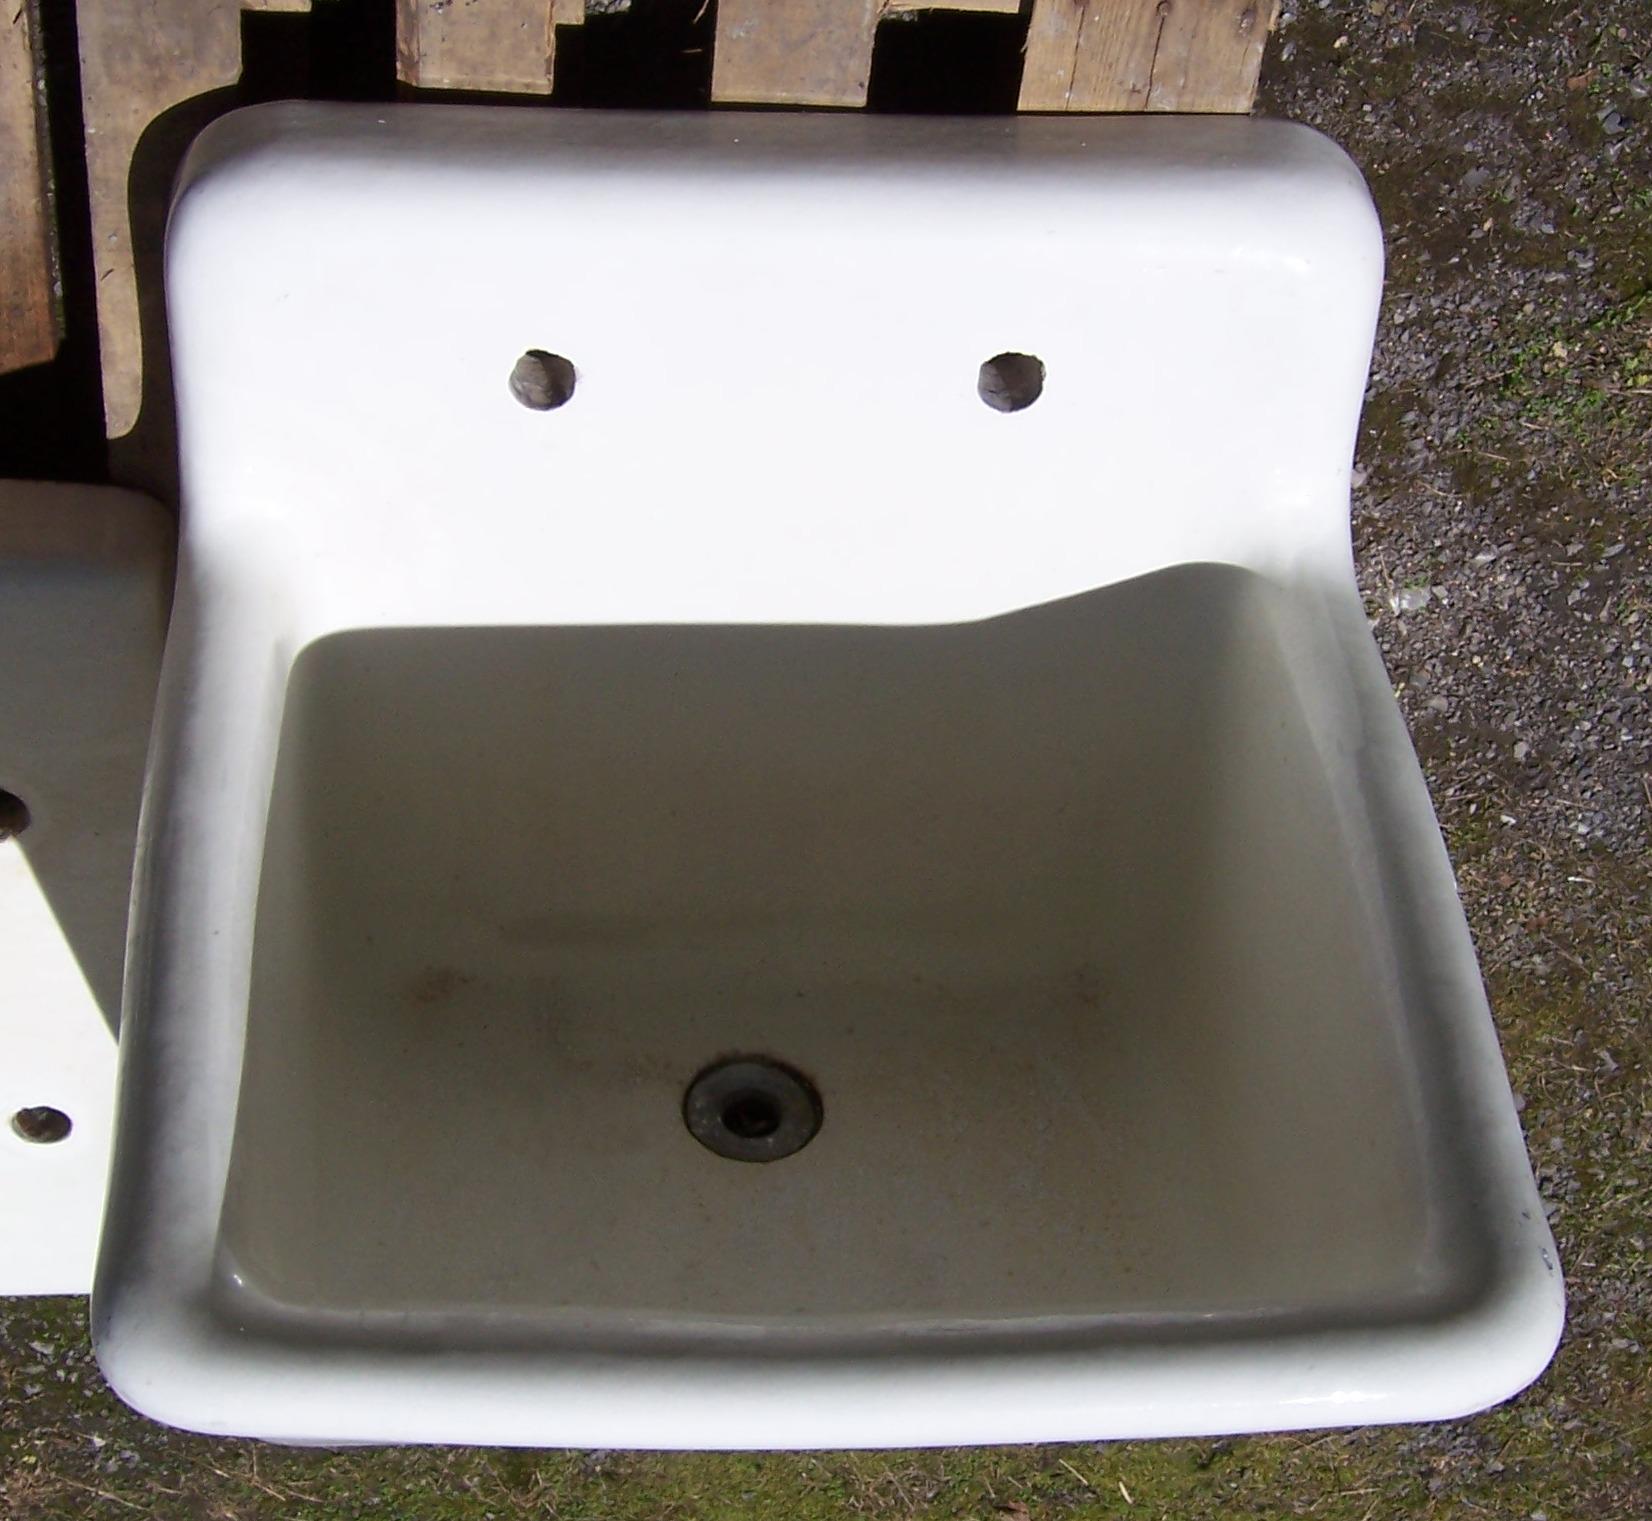 Vintage Utility Sink : Earthenware Utility Sink -26-1/2? x 26-1/2??$950